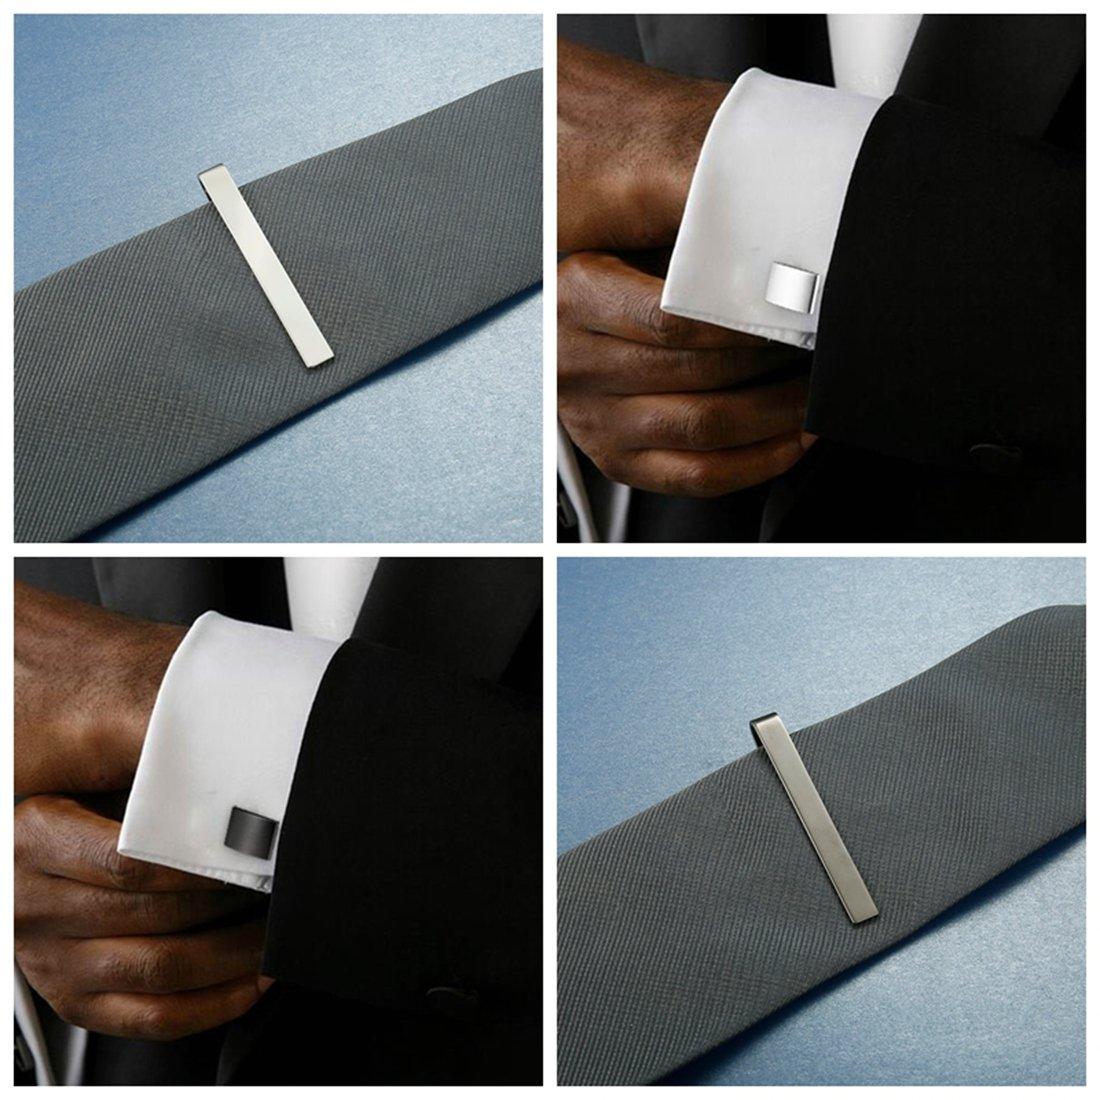 FIBO STEEL Tie Clips Cufflink Set for Men Classic Wedding Cufflinks Mens Dad Birthday Anniversary Gifts by FIBO STEEL (Image #5)